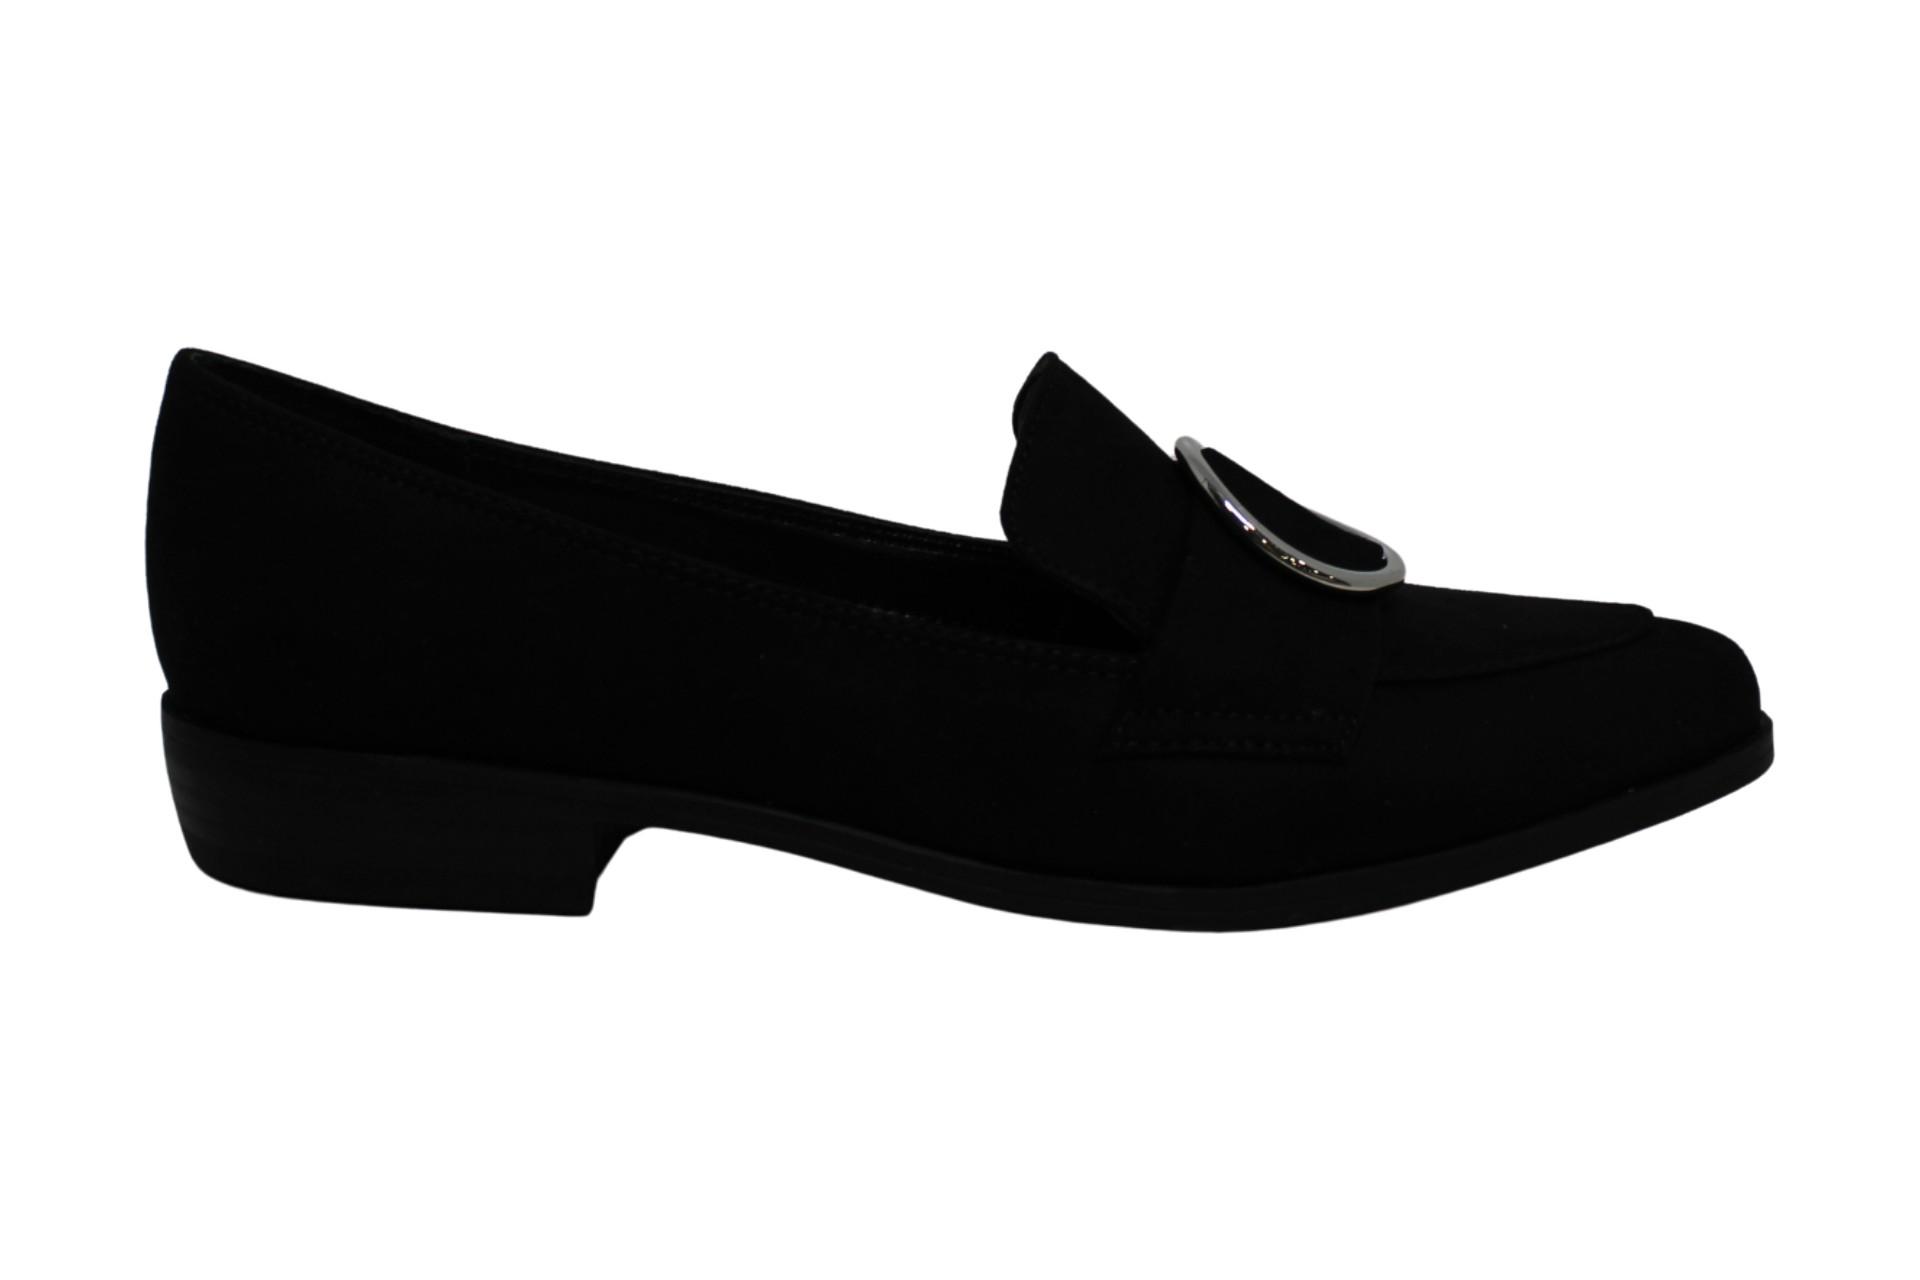 Bar III Womens Involve5 Fabric Pointed Toe Loafers, Black MC, Size 7.0 US / 5 UK